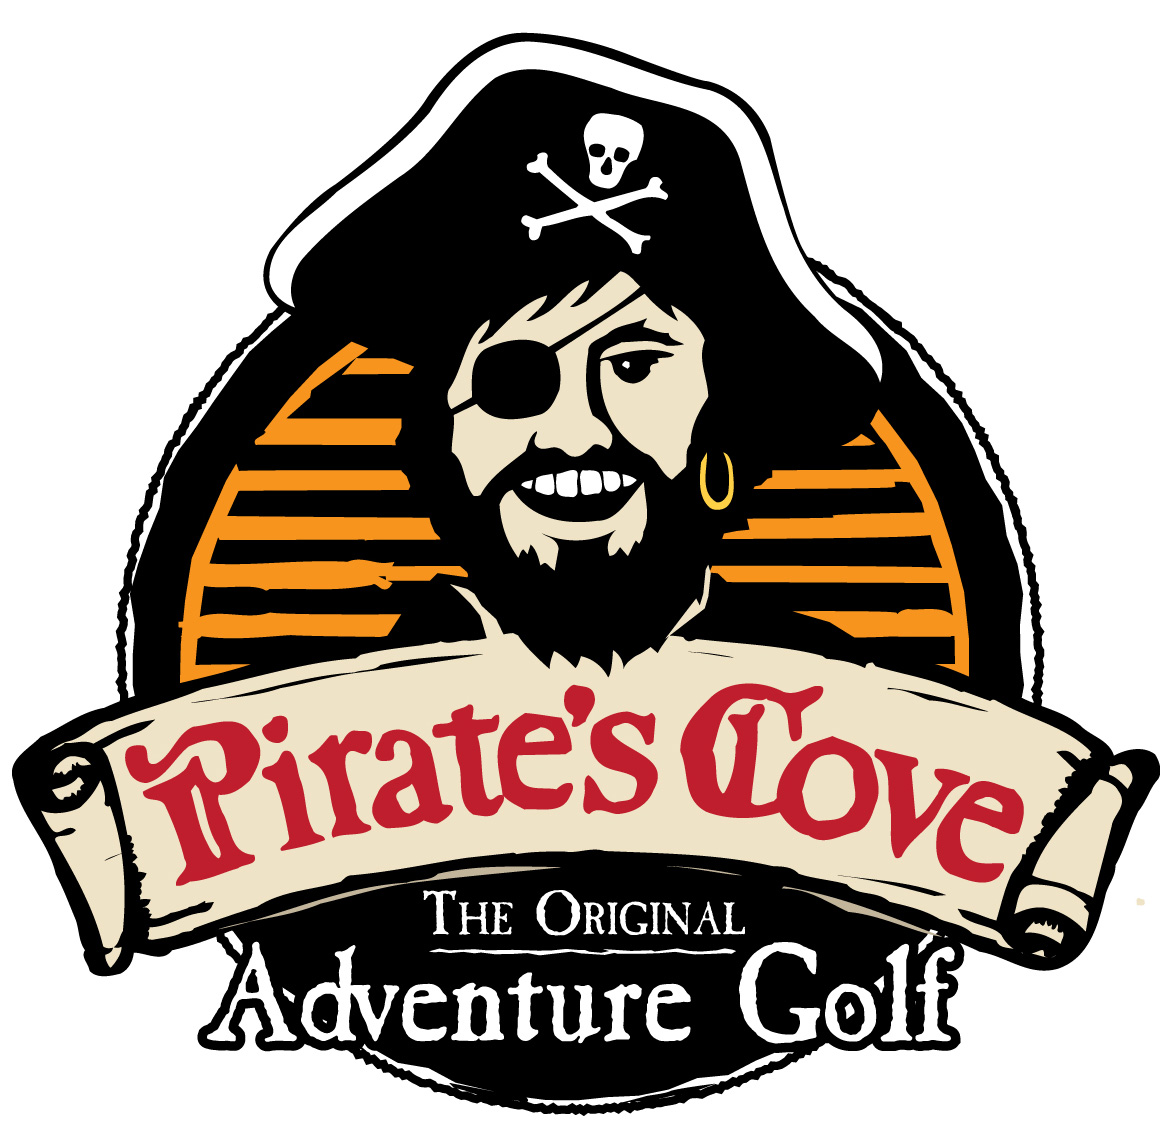 Pirates Cove Adventure Golf